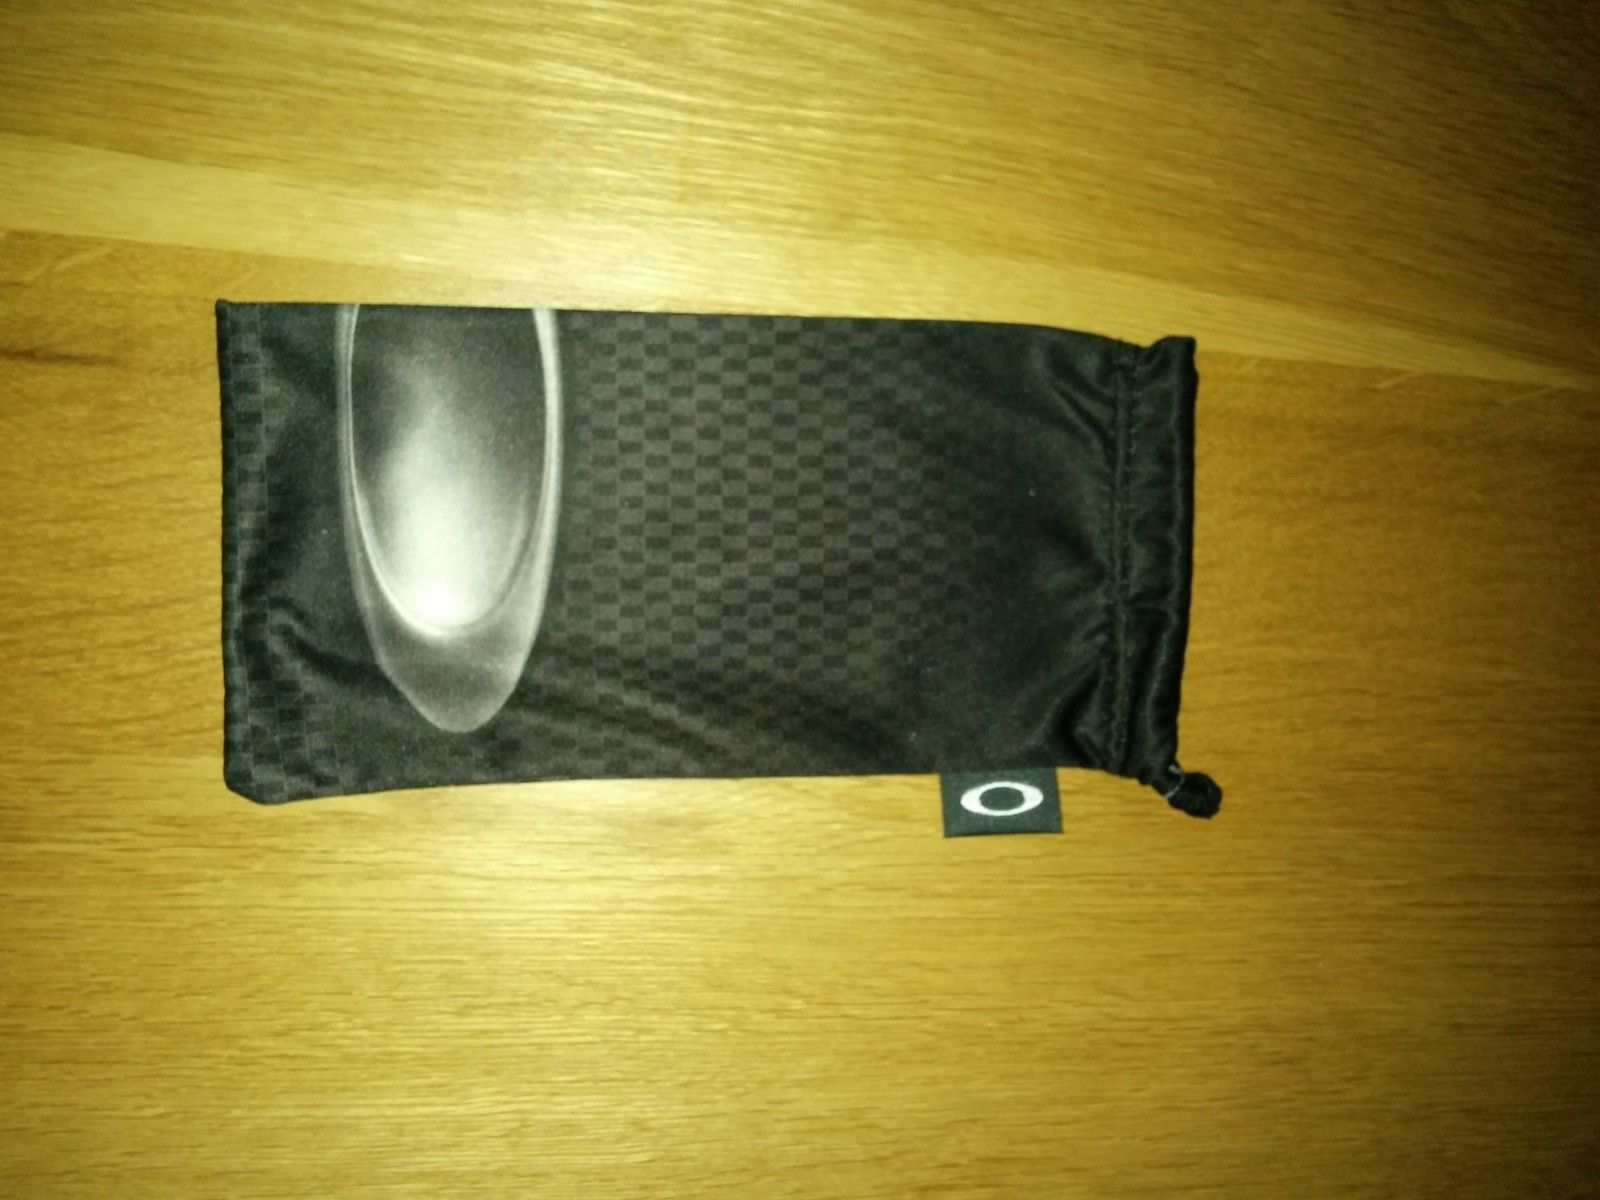 Microfiber bag question - IMG_20150529_203027.jpg